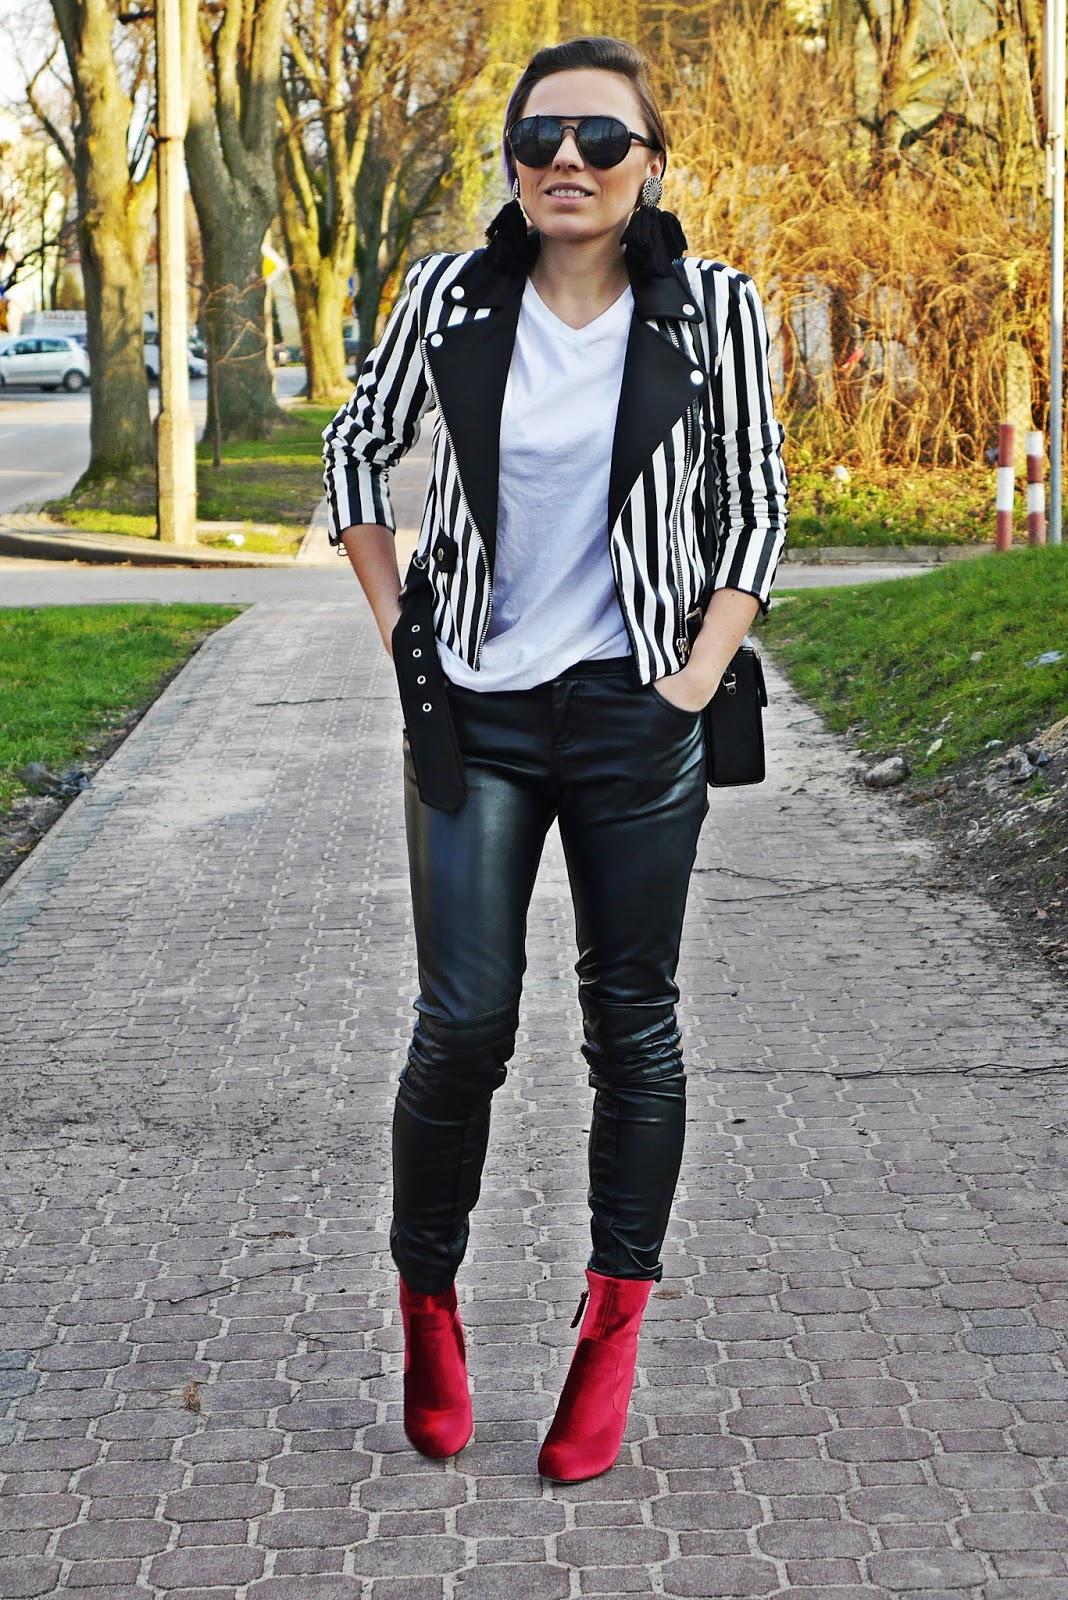 1_leather_pants_stripes_biker_jacket_red_velvet_white_tshirt_karyn_blog_modowy_111217f